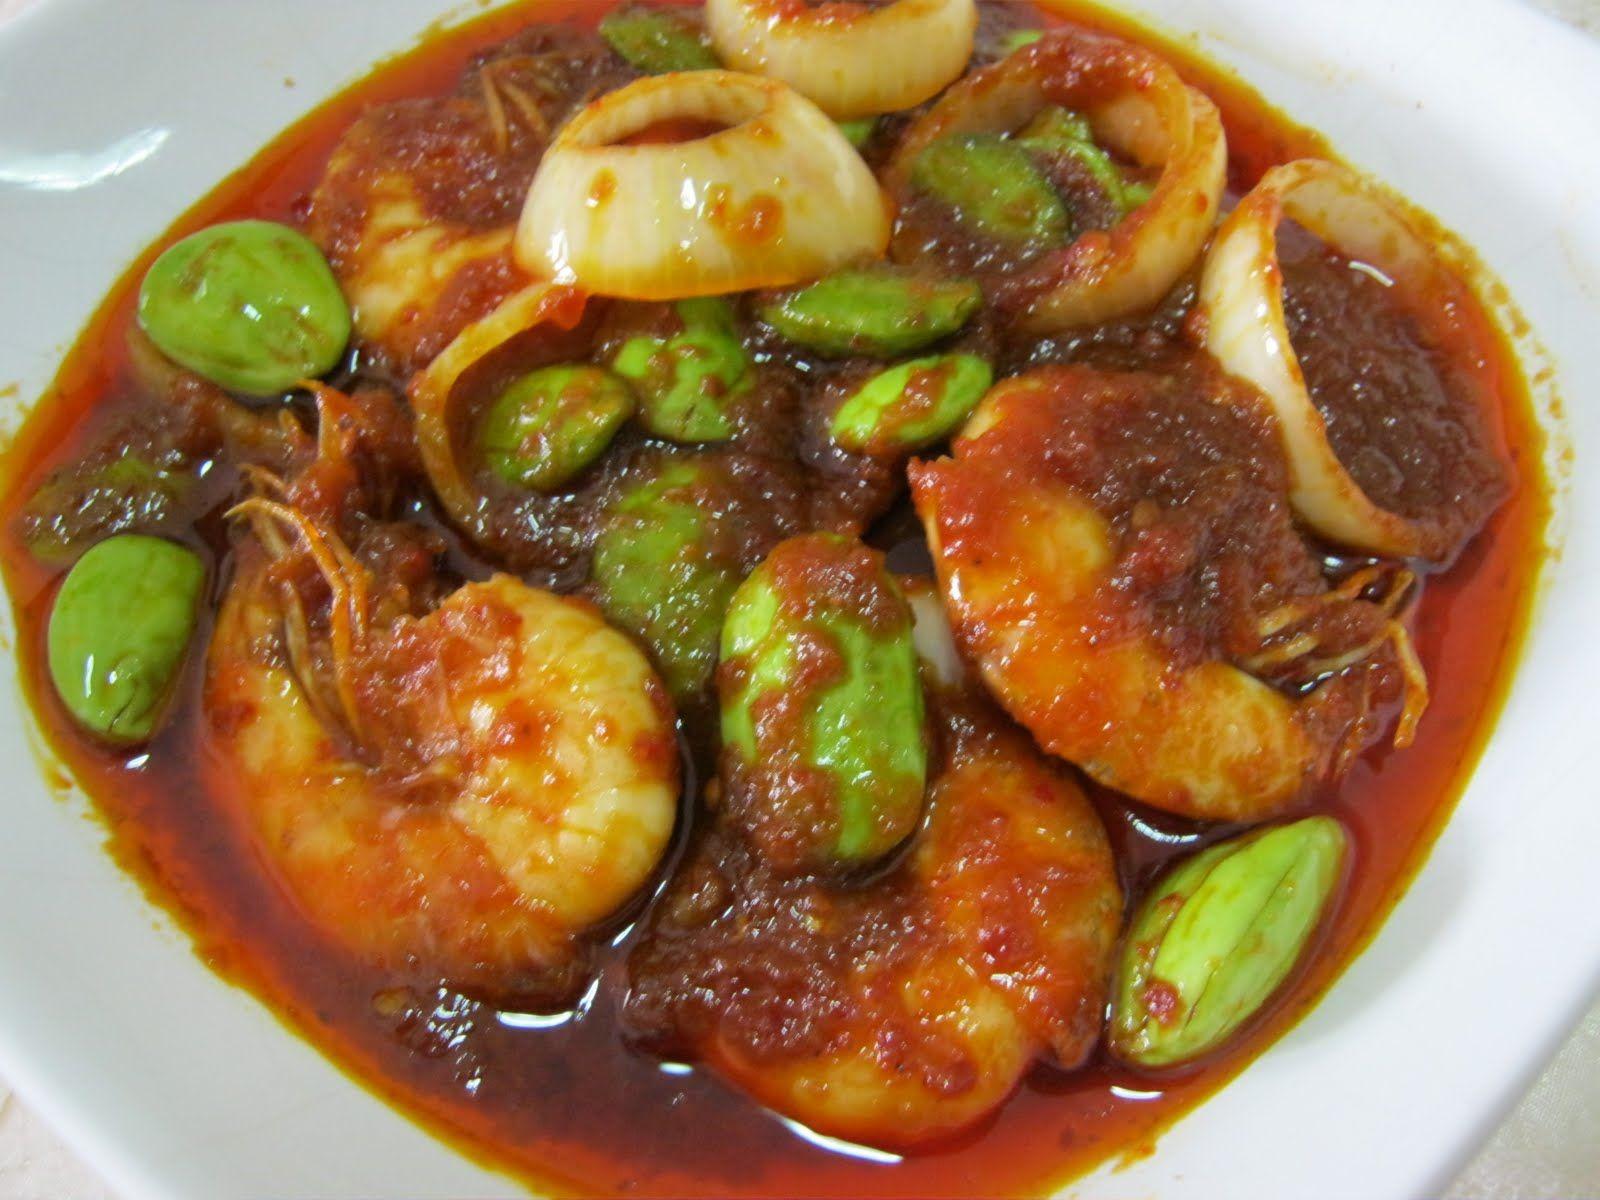 Menu Masakan Jawa Resep Seafood Makanan Dan Minuman Resep Masakan